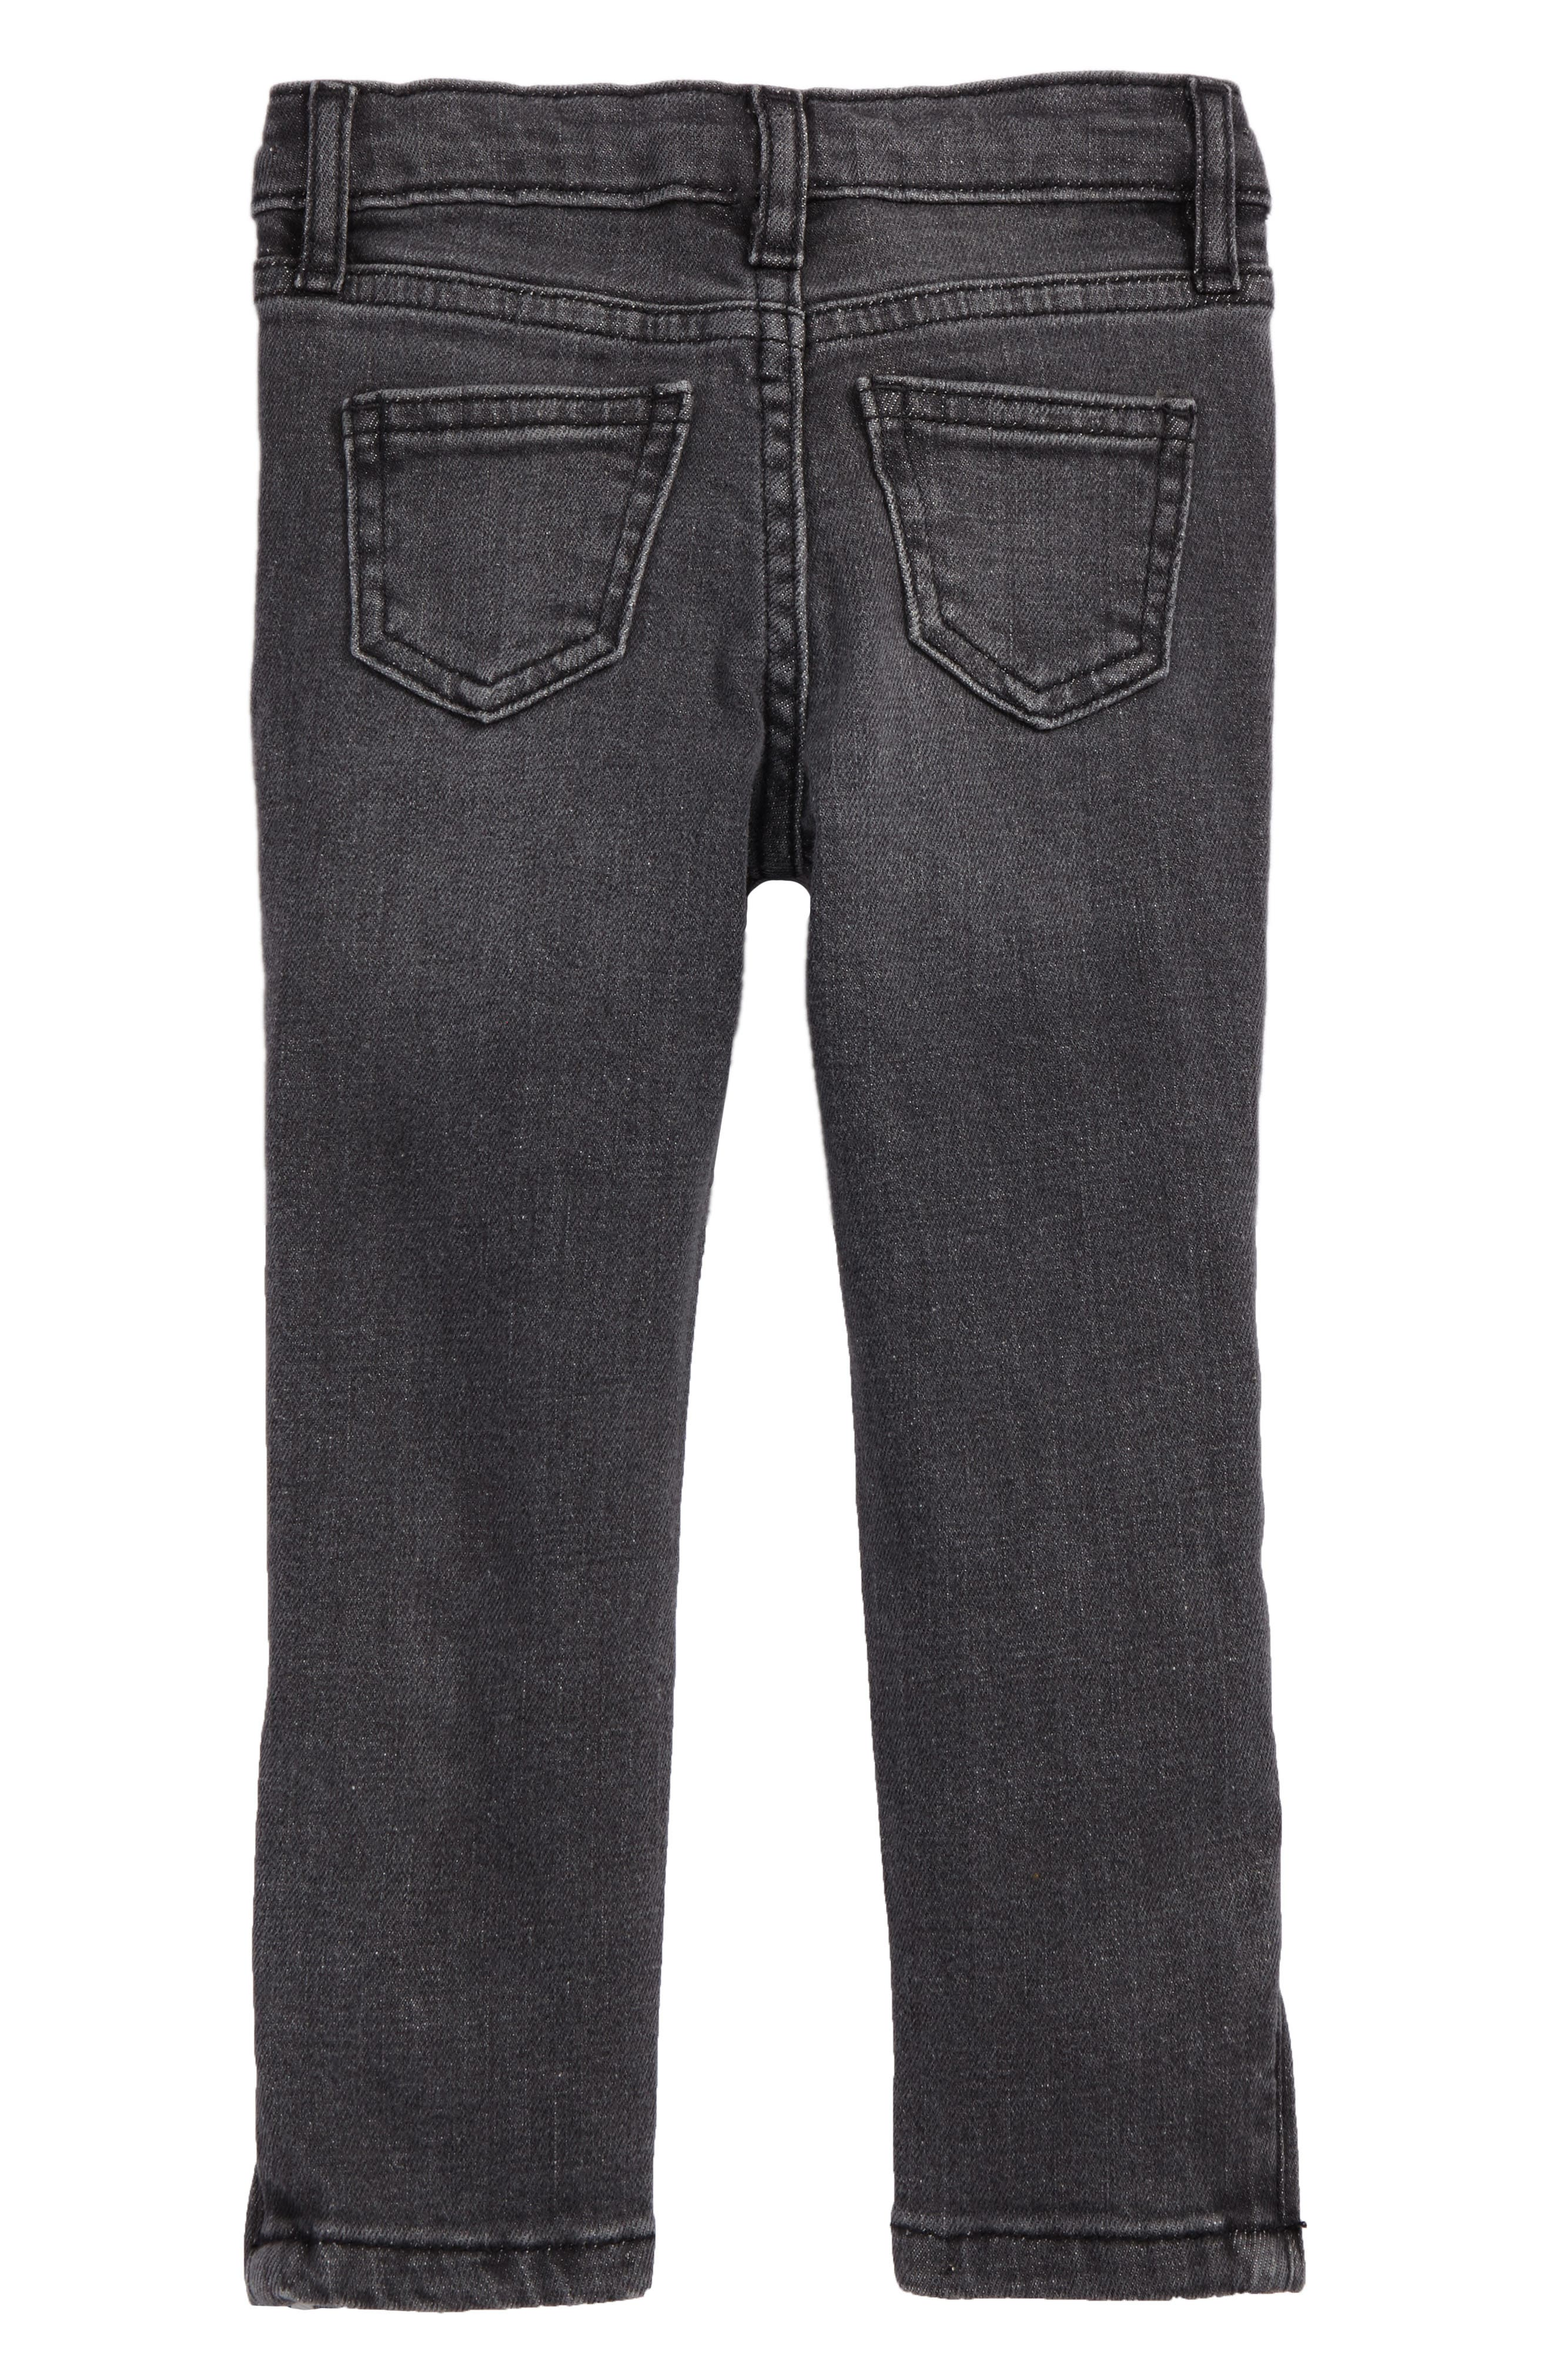 Sasha Skinny Jeans,                             Alternate thumbnail 2, color,                             Grey